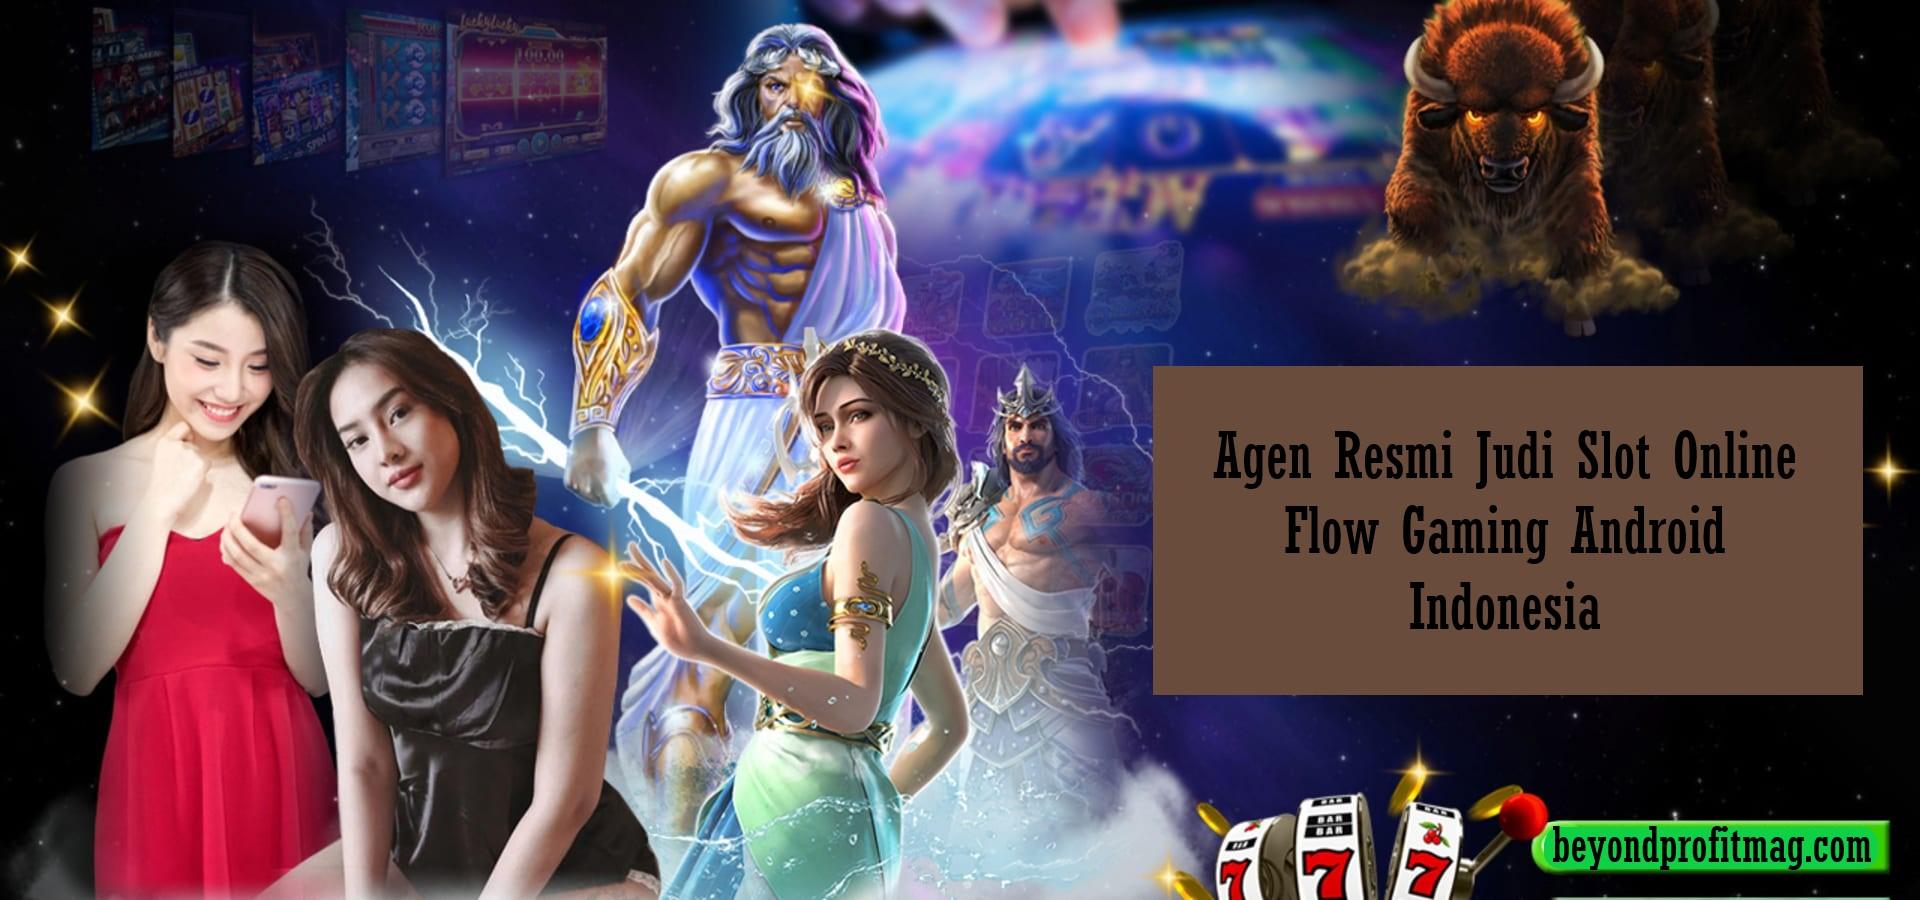 Agen Resmi Judi Slot Online Flow Gaming Android Indonesia